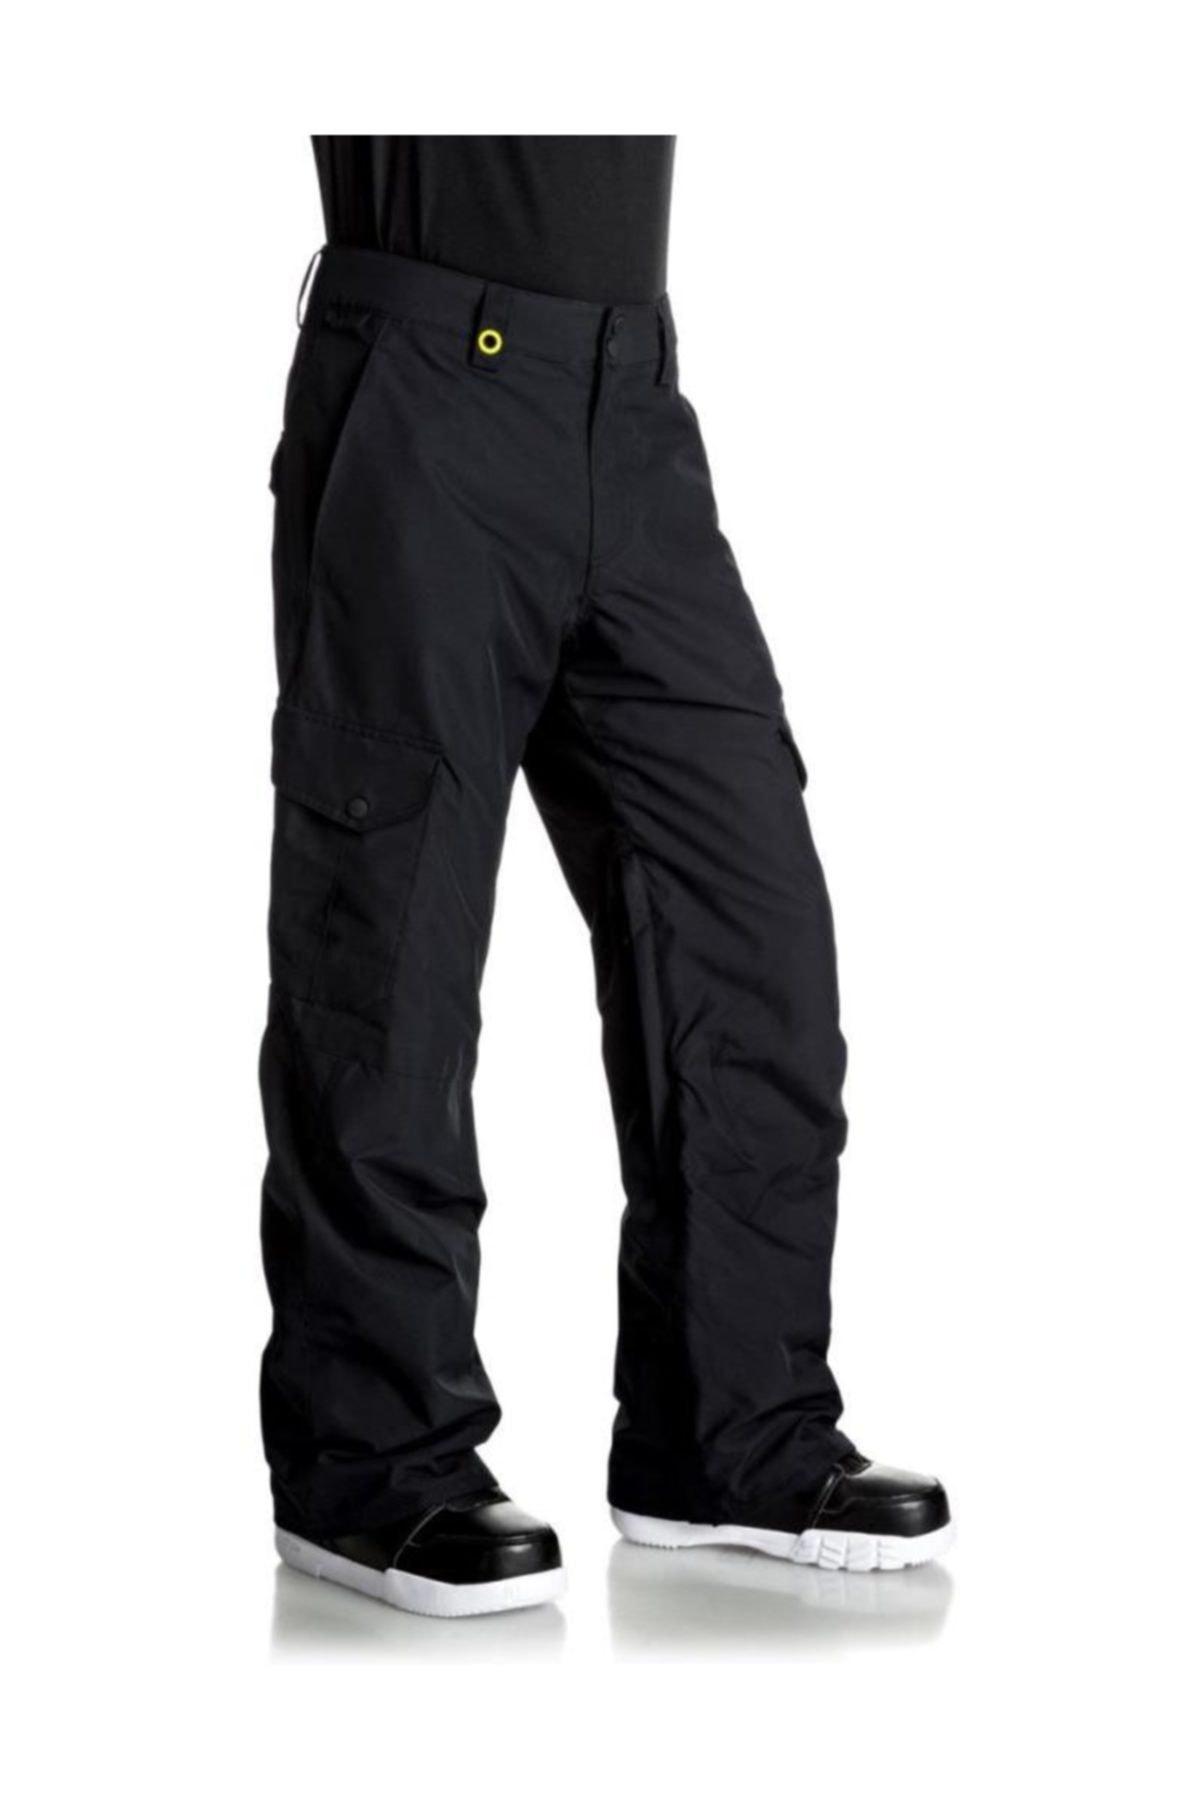 Quiksilver Porter Erkek Kayak ve Snowboard Pantolonu Siyah 1